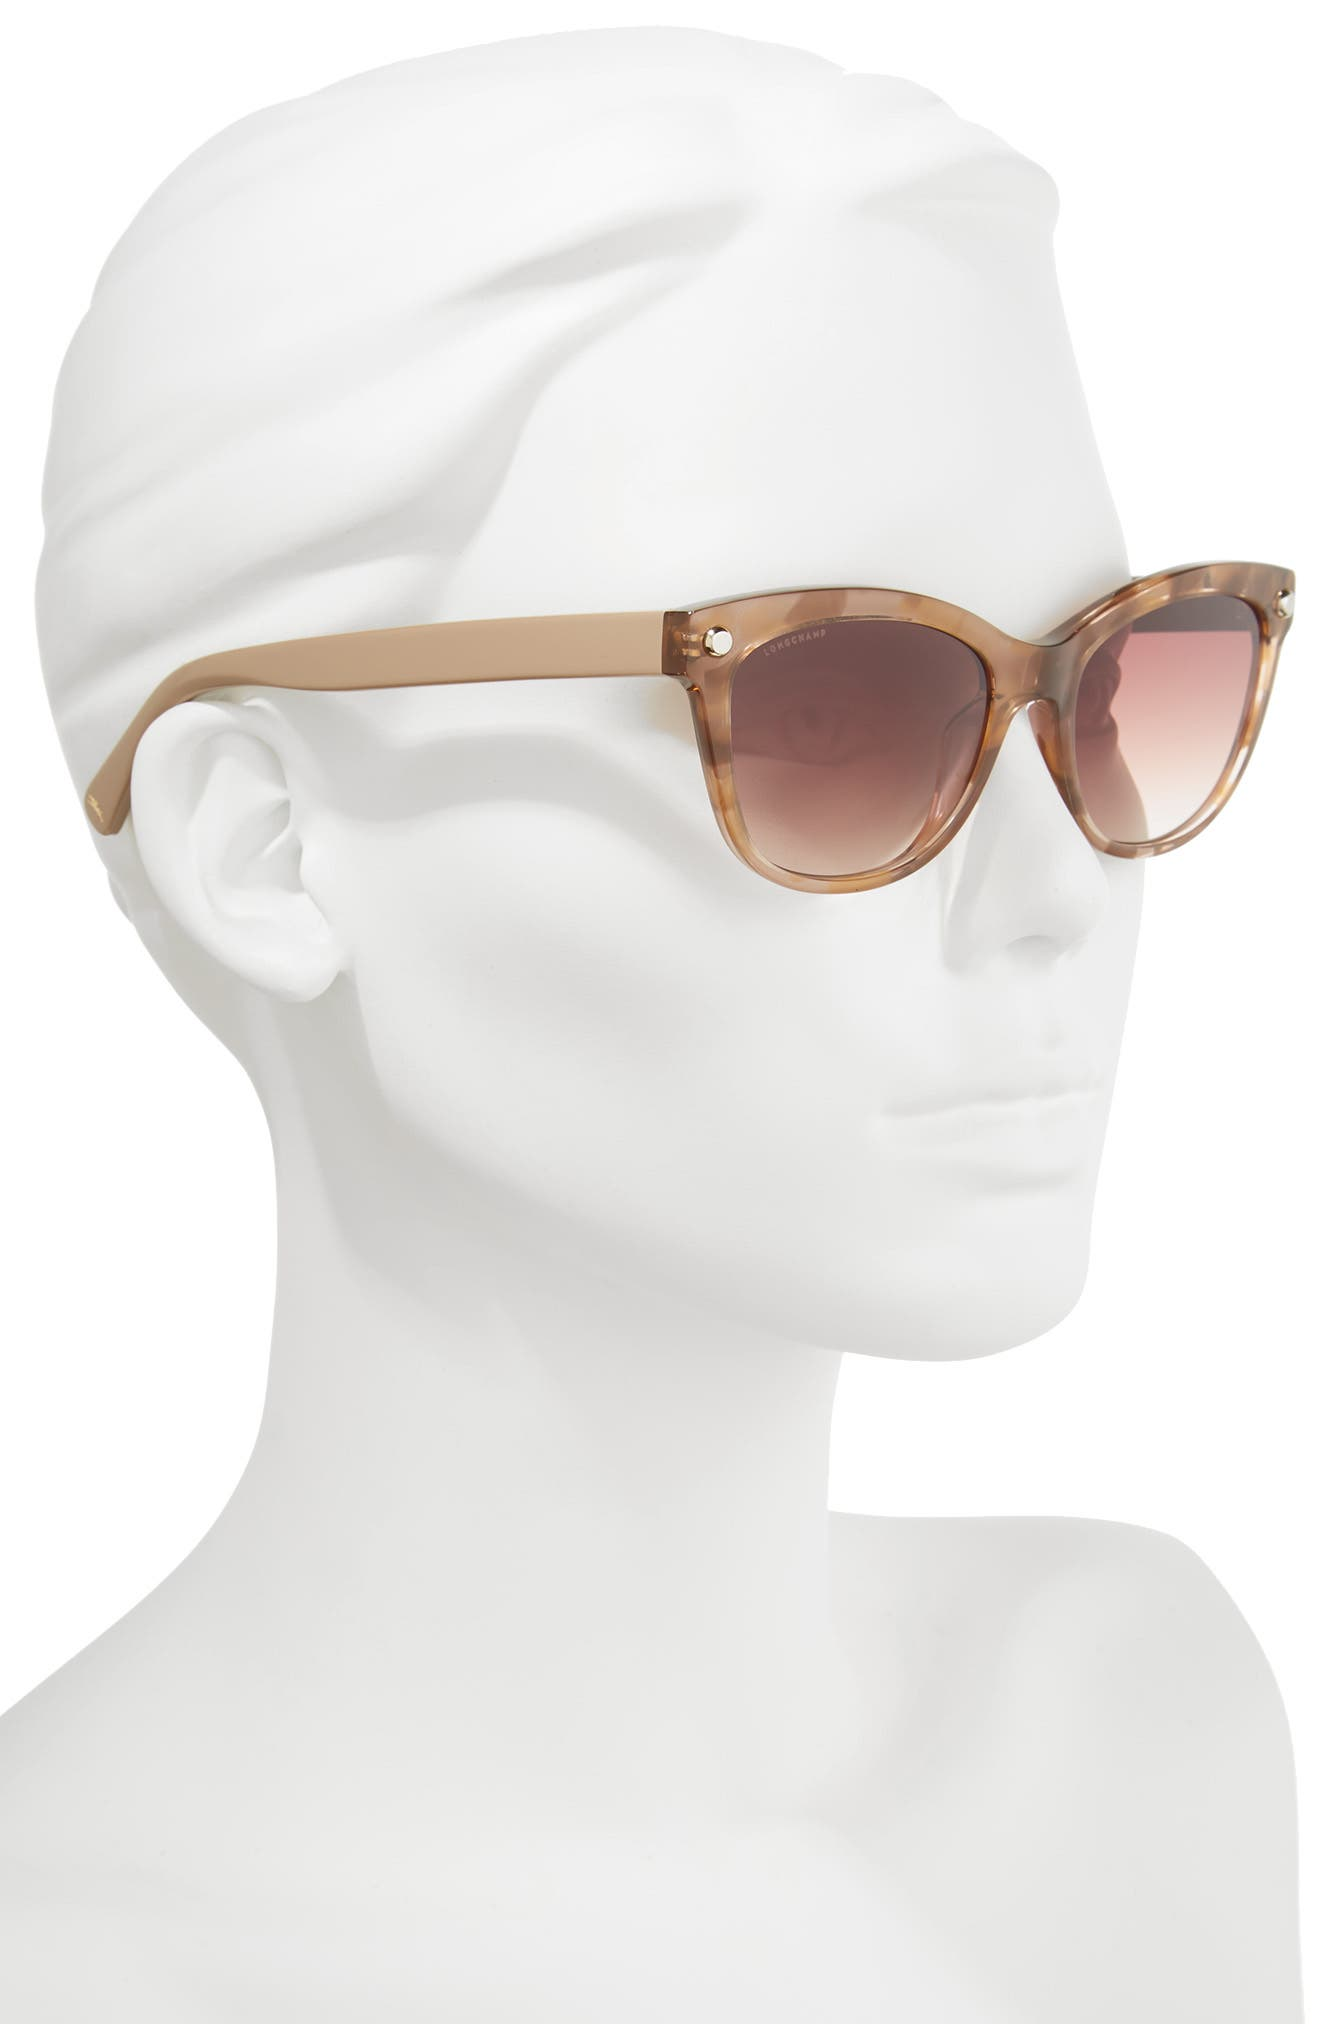 53mm Gradient Lens Cat Eye Sunglasses,                             Alternate thumbnail 2, color,                             MARBLE BEIGE